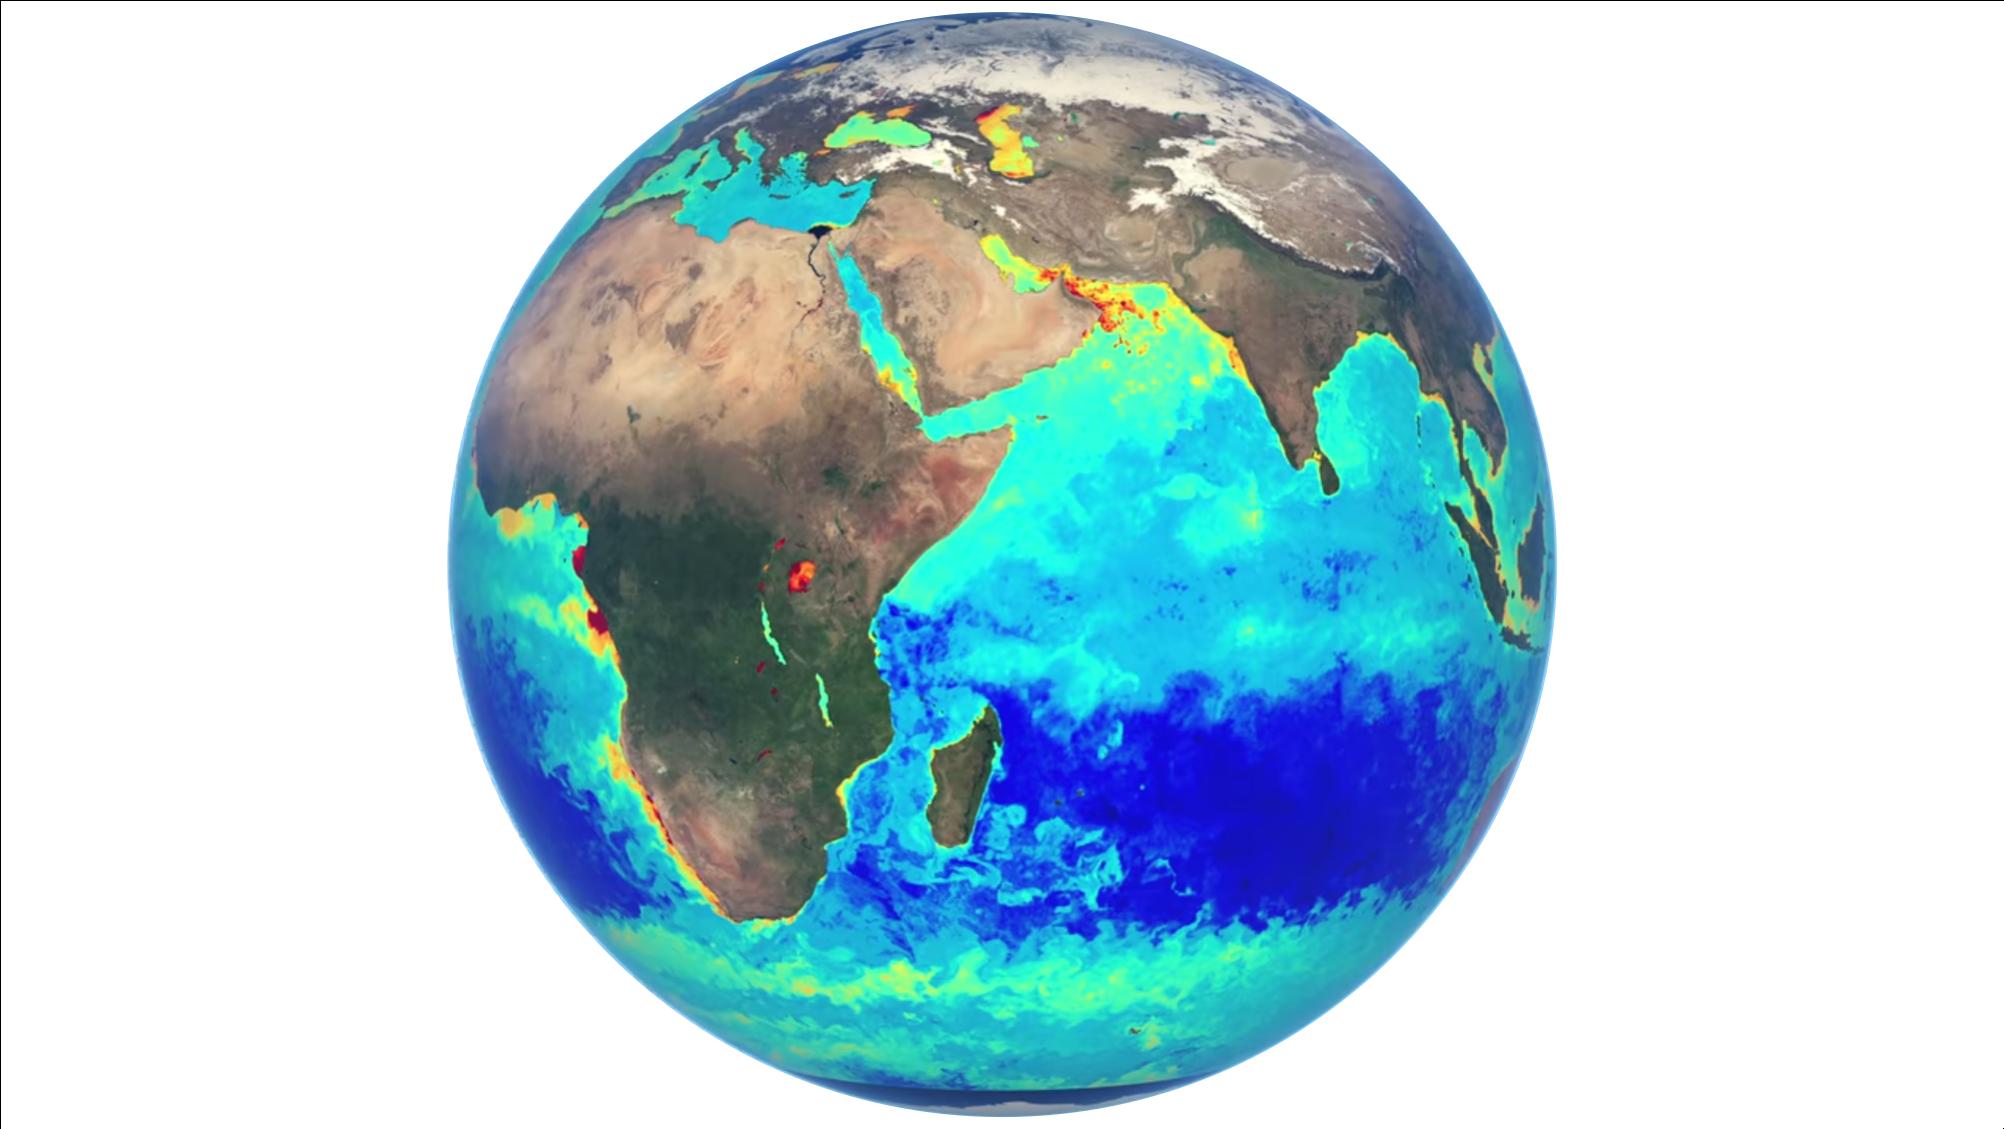 Snapshot of globe showing ocean colour